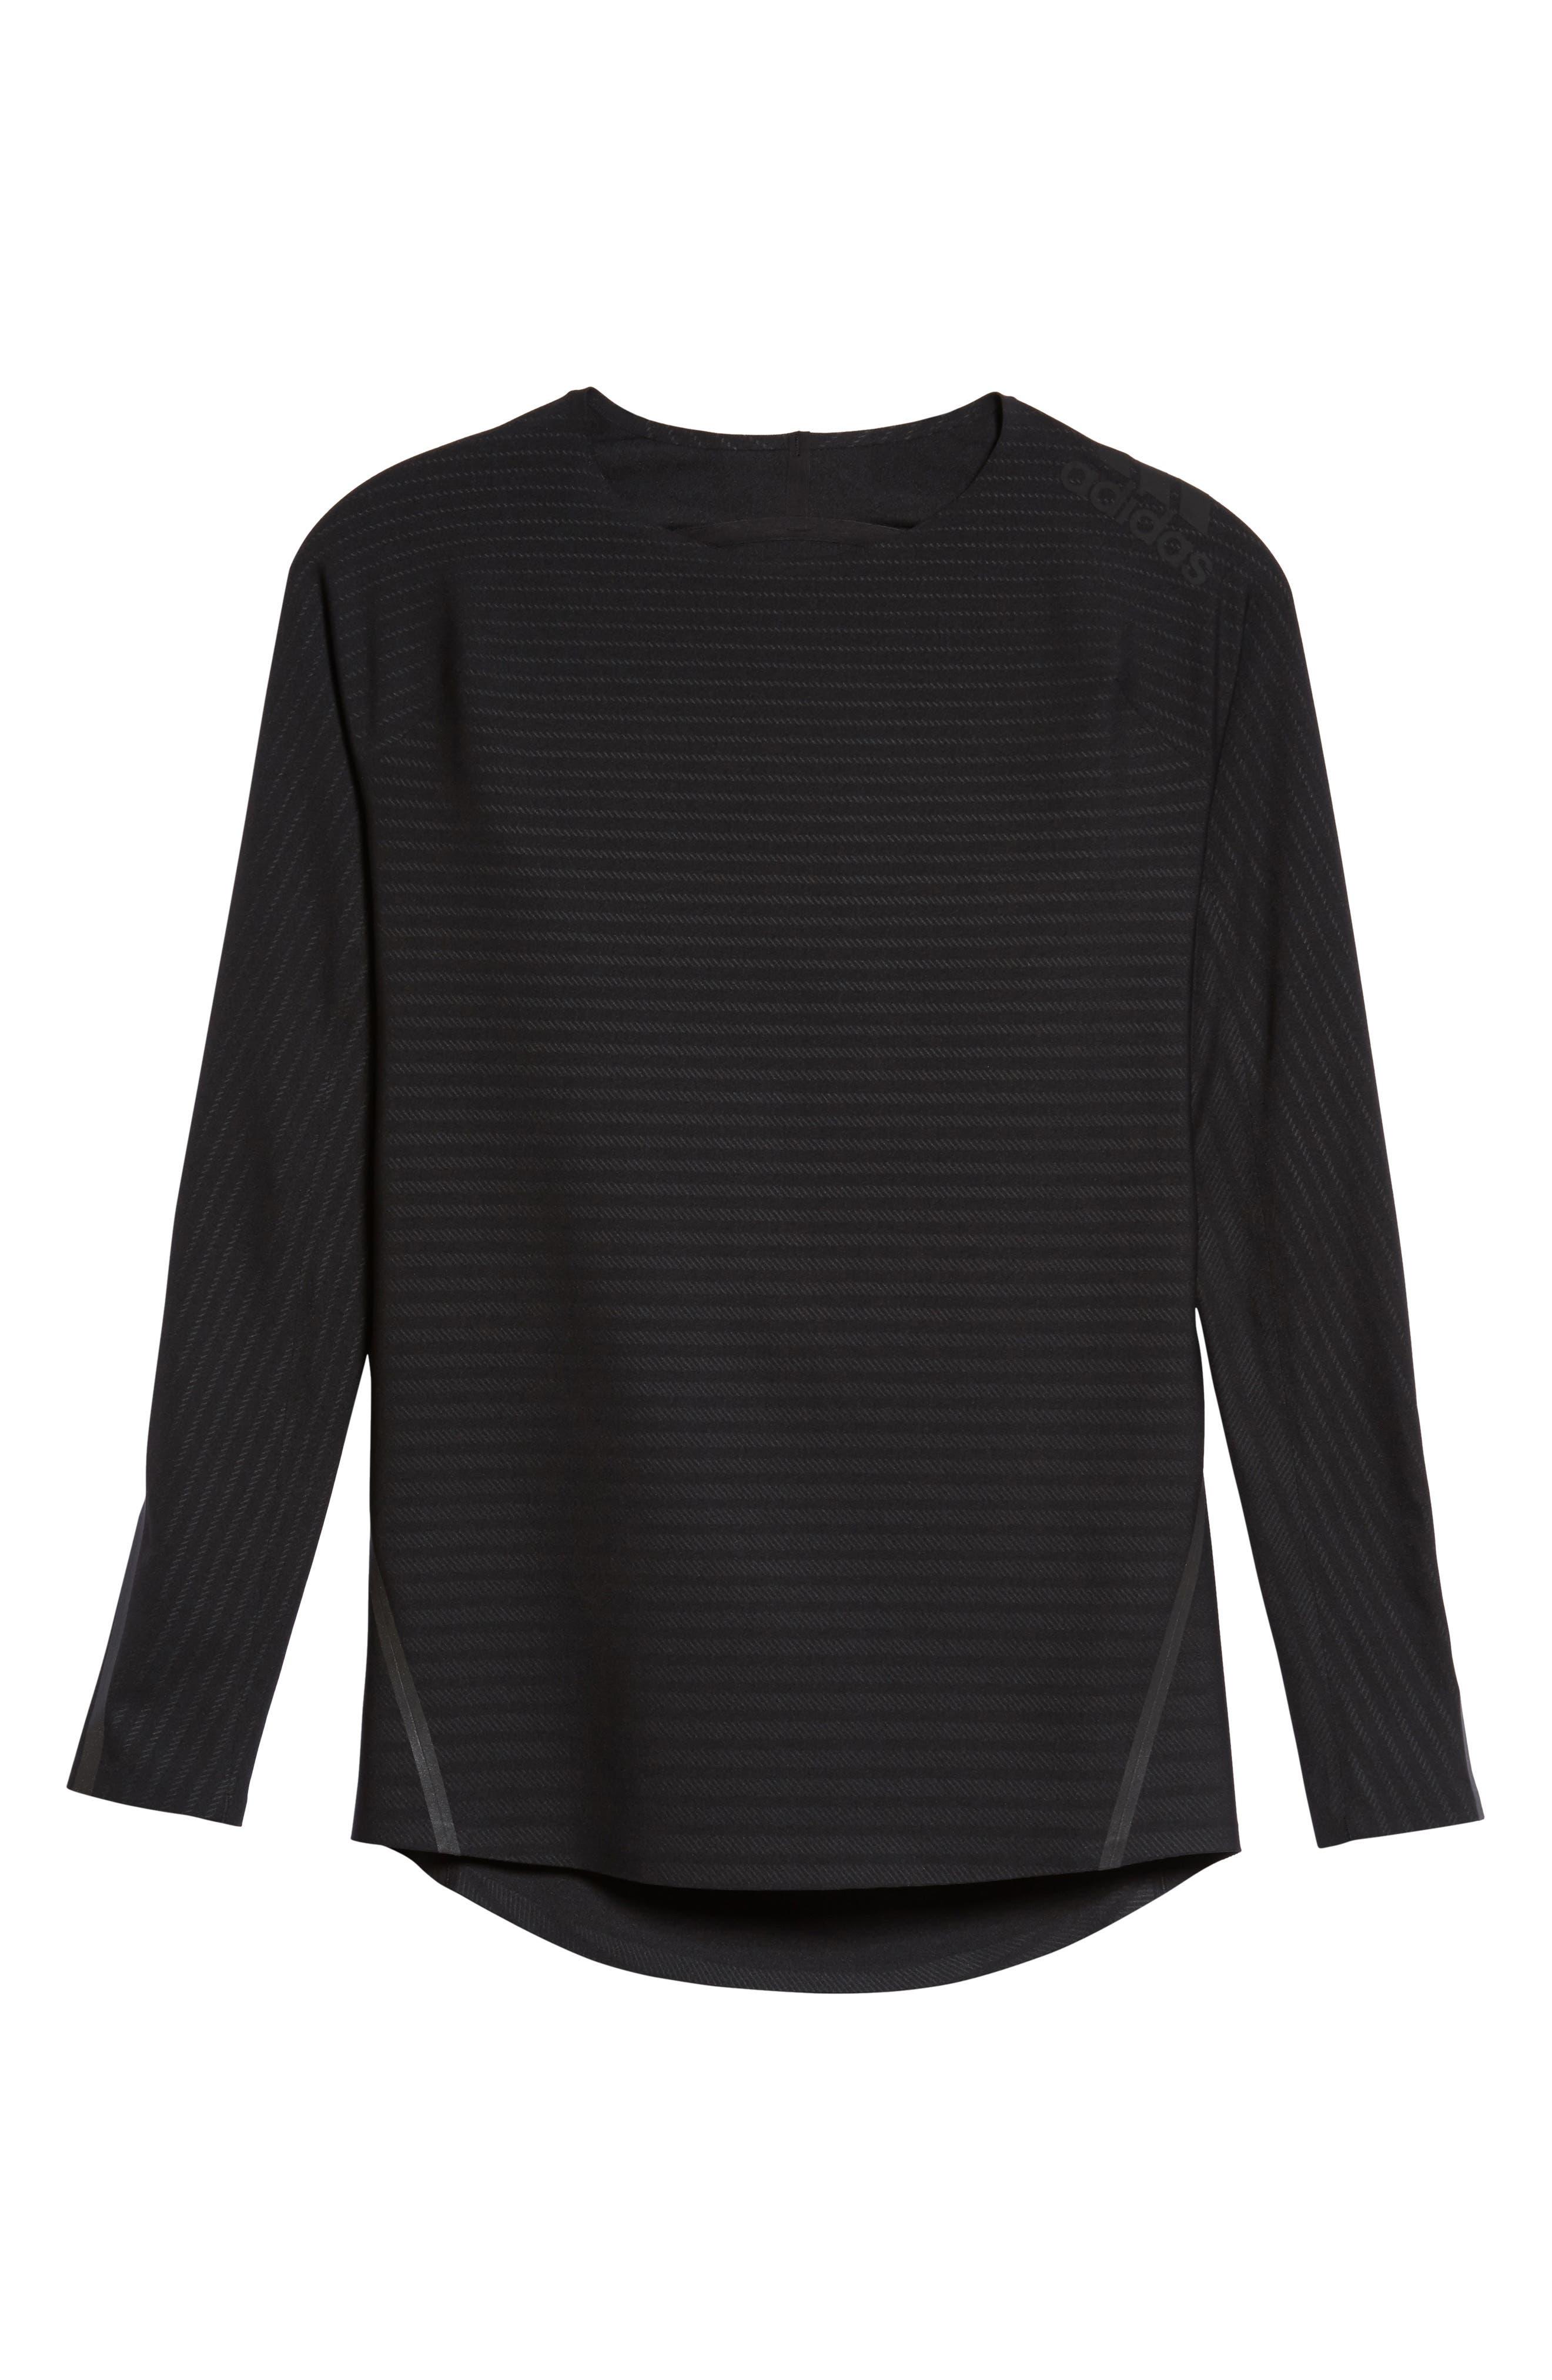 Alphaskin 360 Long Sleeve T-Shirt,                             Alternate thumbnail 2, color,                             Black